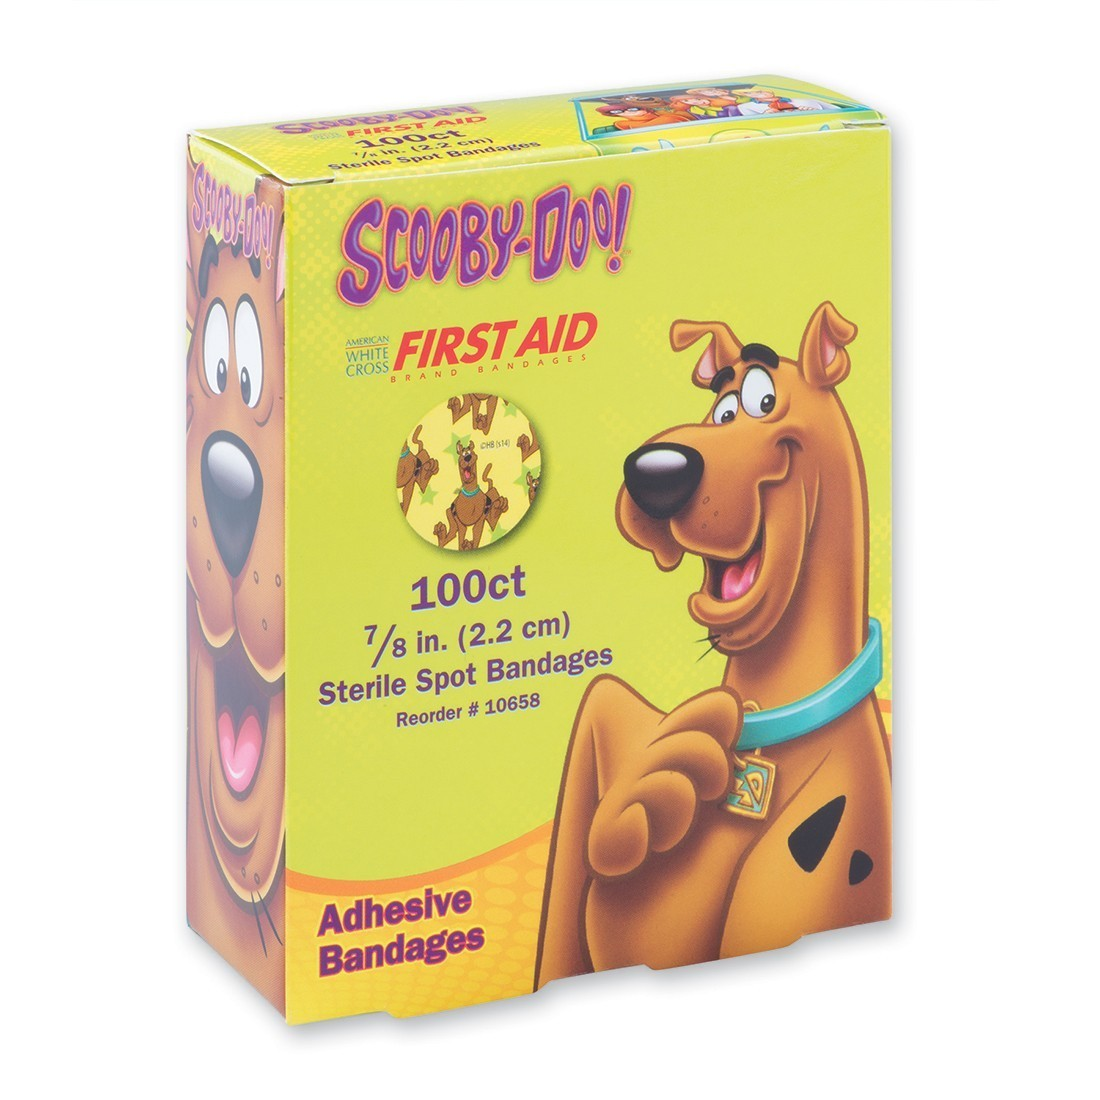 Scooby Doo Spot Bandages [image]